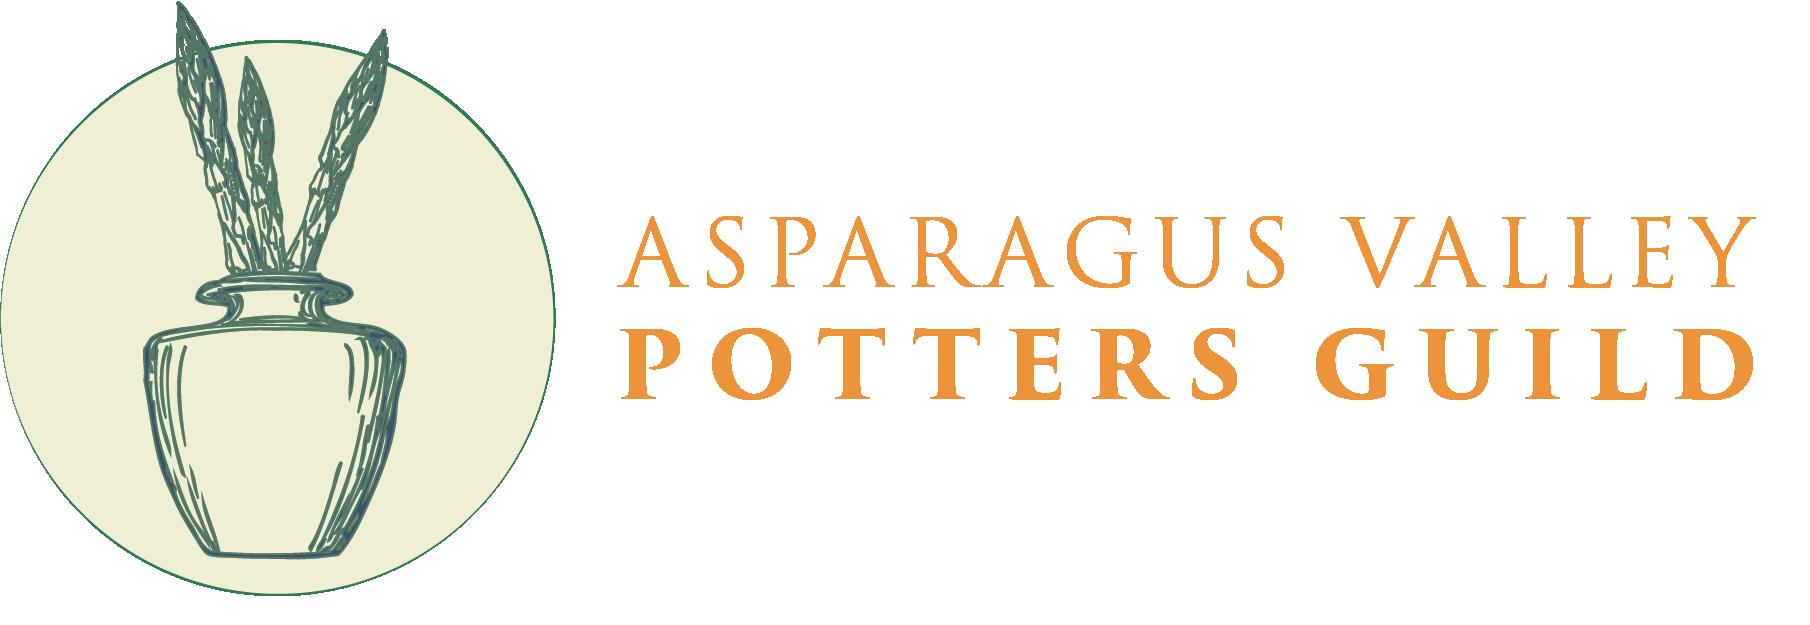 Asparagus Valley Potters Guild